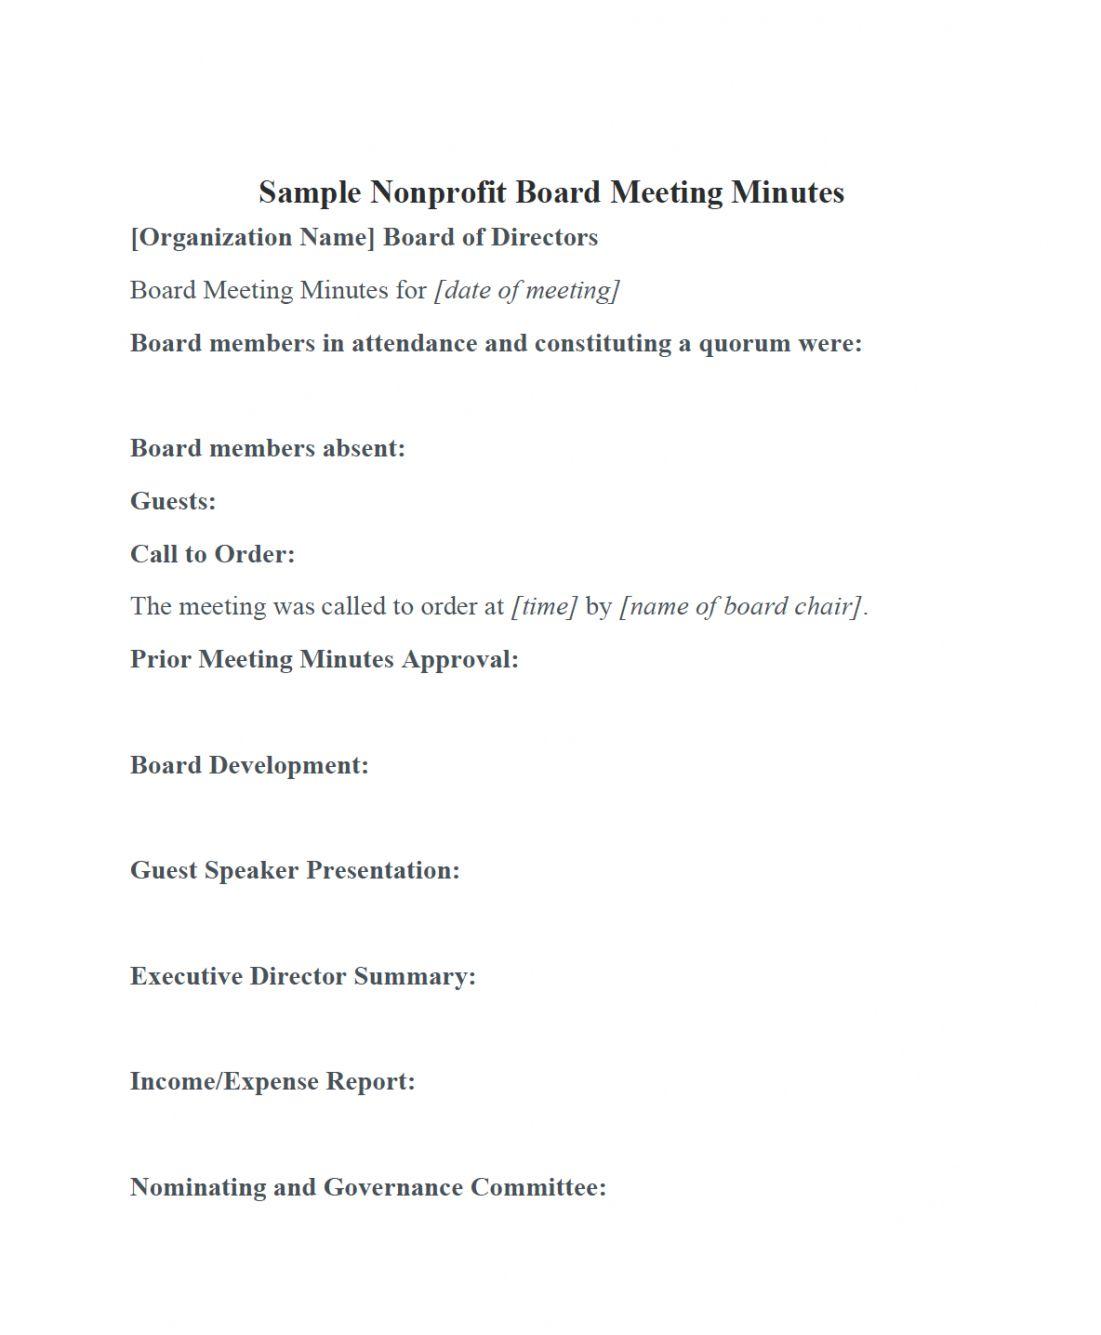 Printable Nonprofit Board Meeting Minutes Template Diligent Insights Non Profit Meeting Agen In 2020 Agenda Template Meeting Agenda Template Meeting Agenda